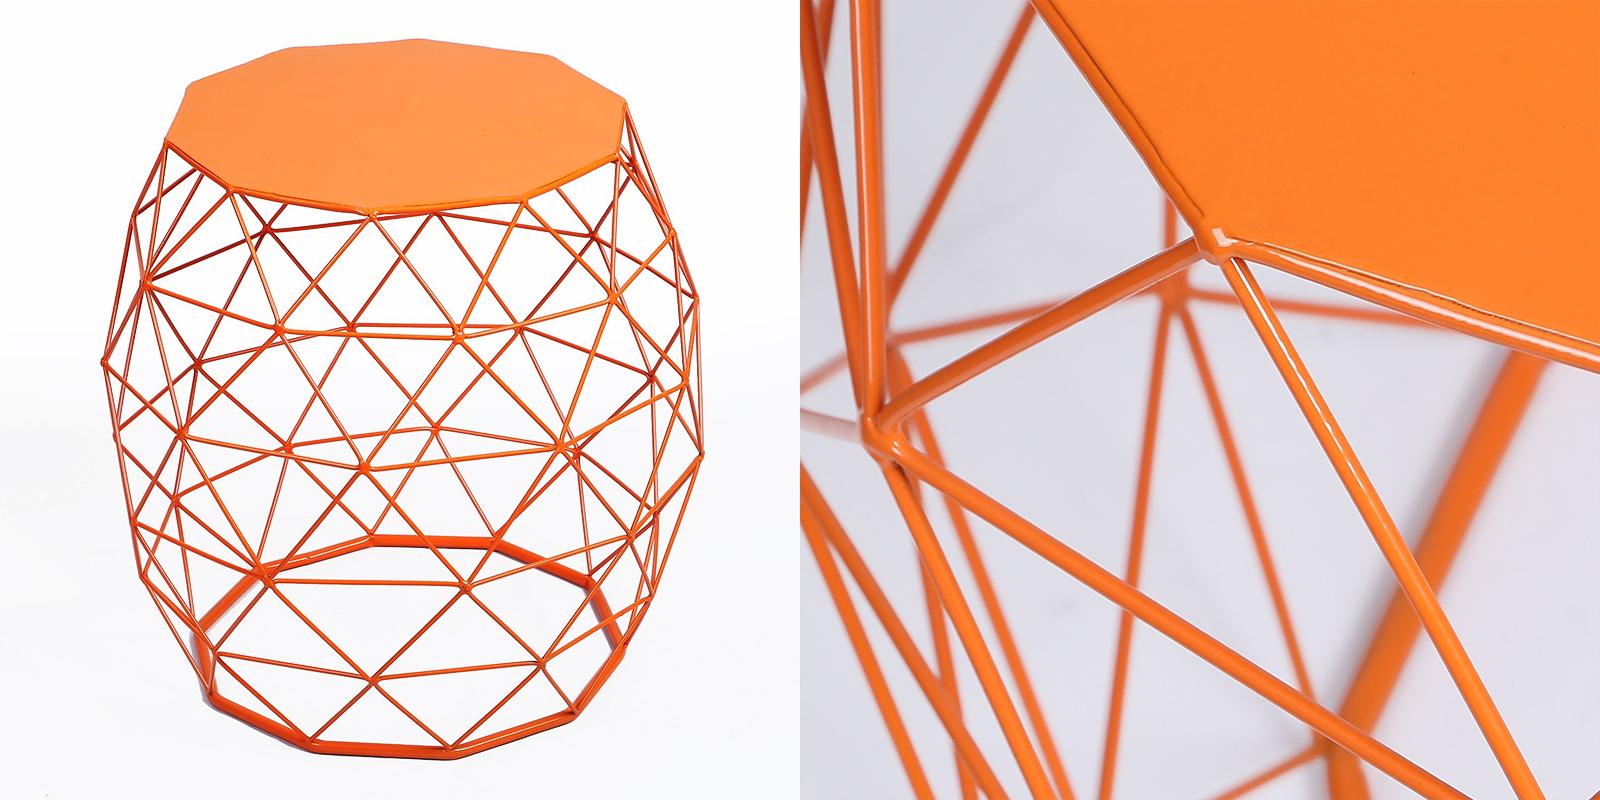 Patio Chair - Hatched Diamond Pattern Metal Stool